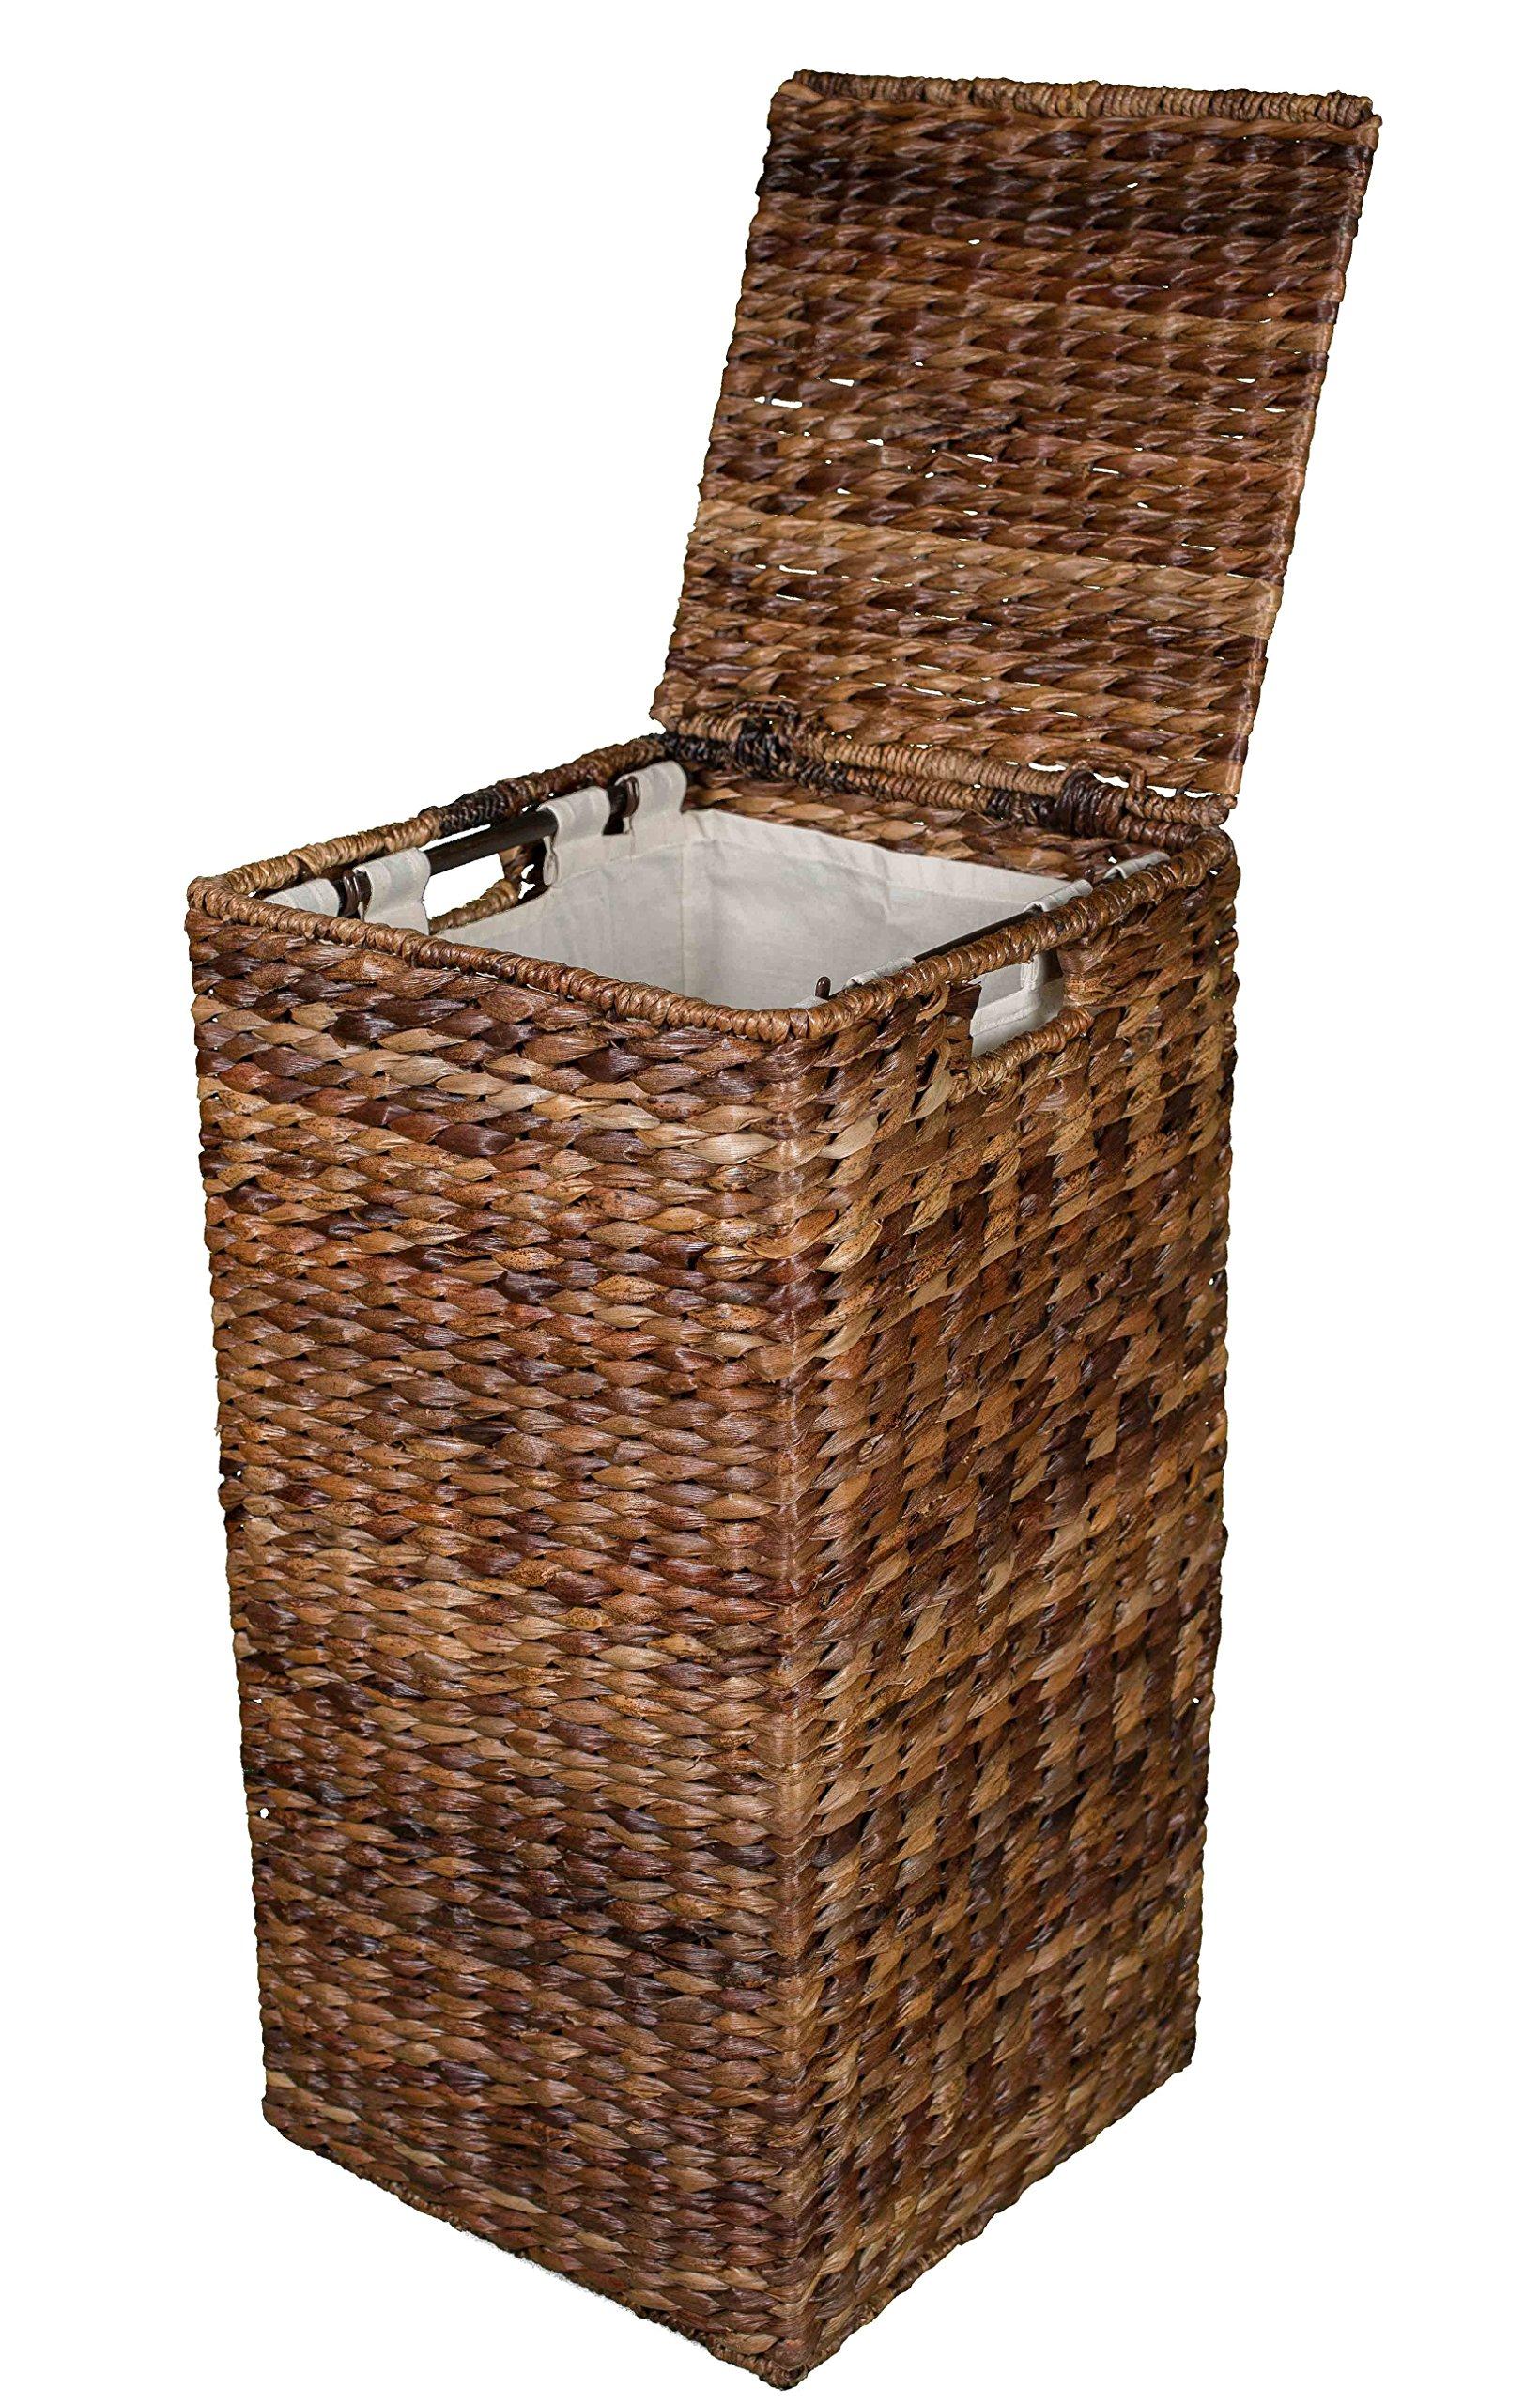 Birdrock Home Seagrass Laundry Hamper | Hand Woven | Renewable | Long Lasting (Square Abaca Hamper)